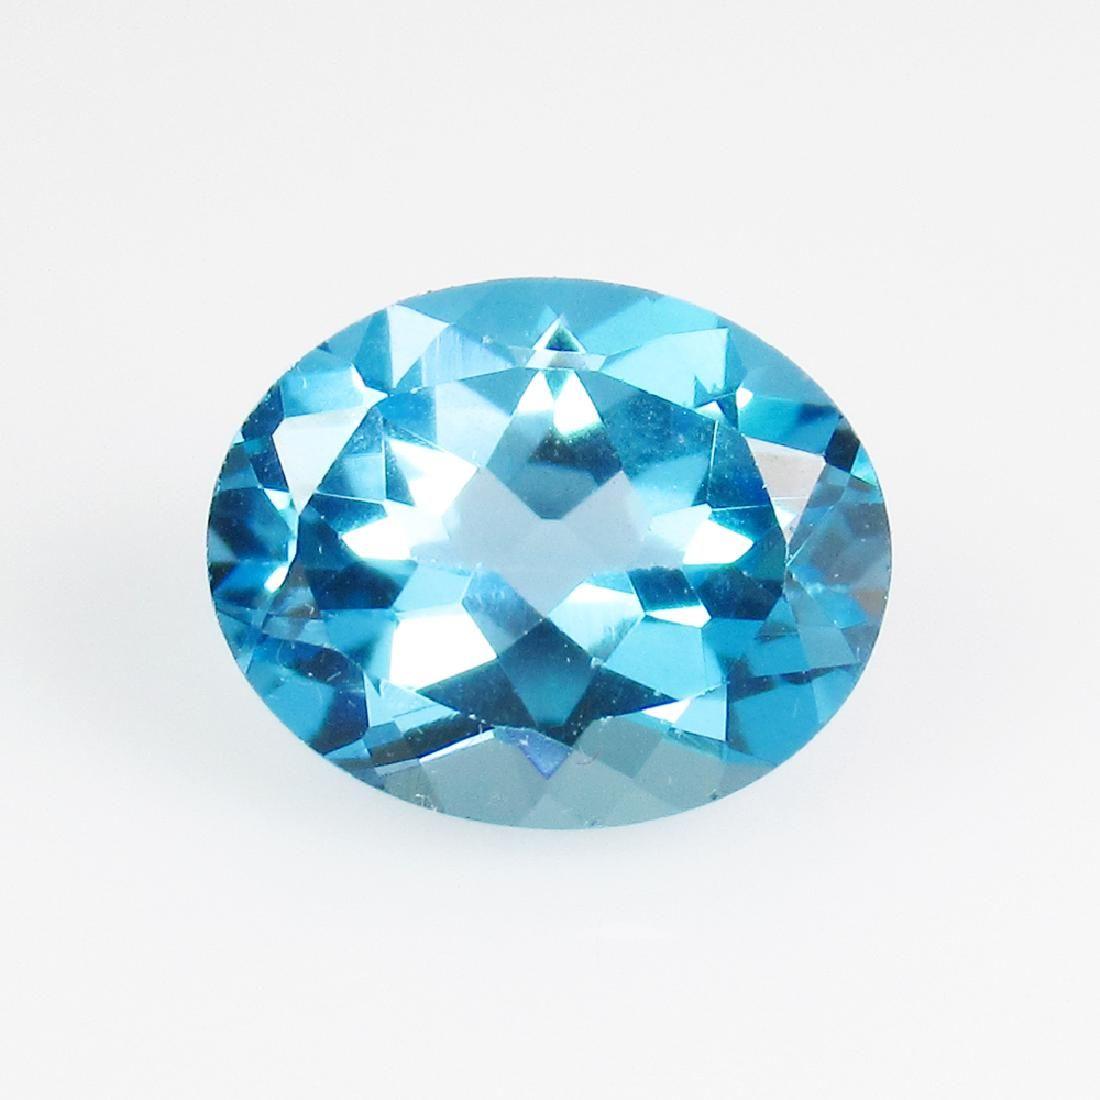 3.05 Ct Genuine Swiss Blue Topaz 10X8 mm Oval Cut